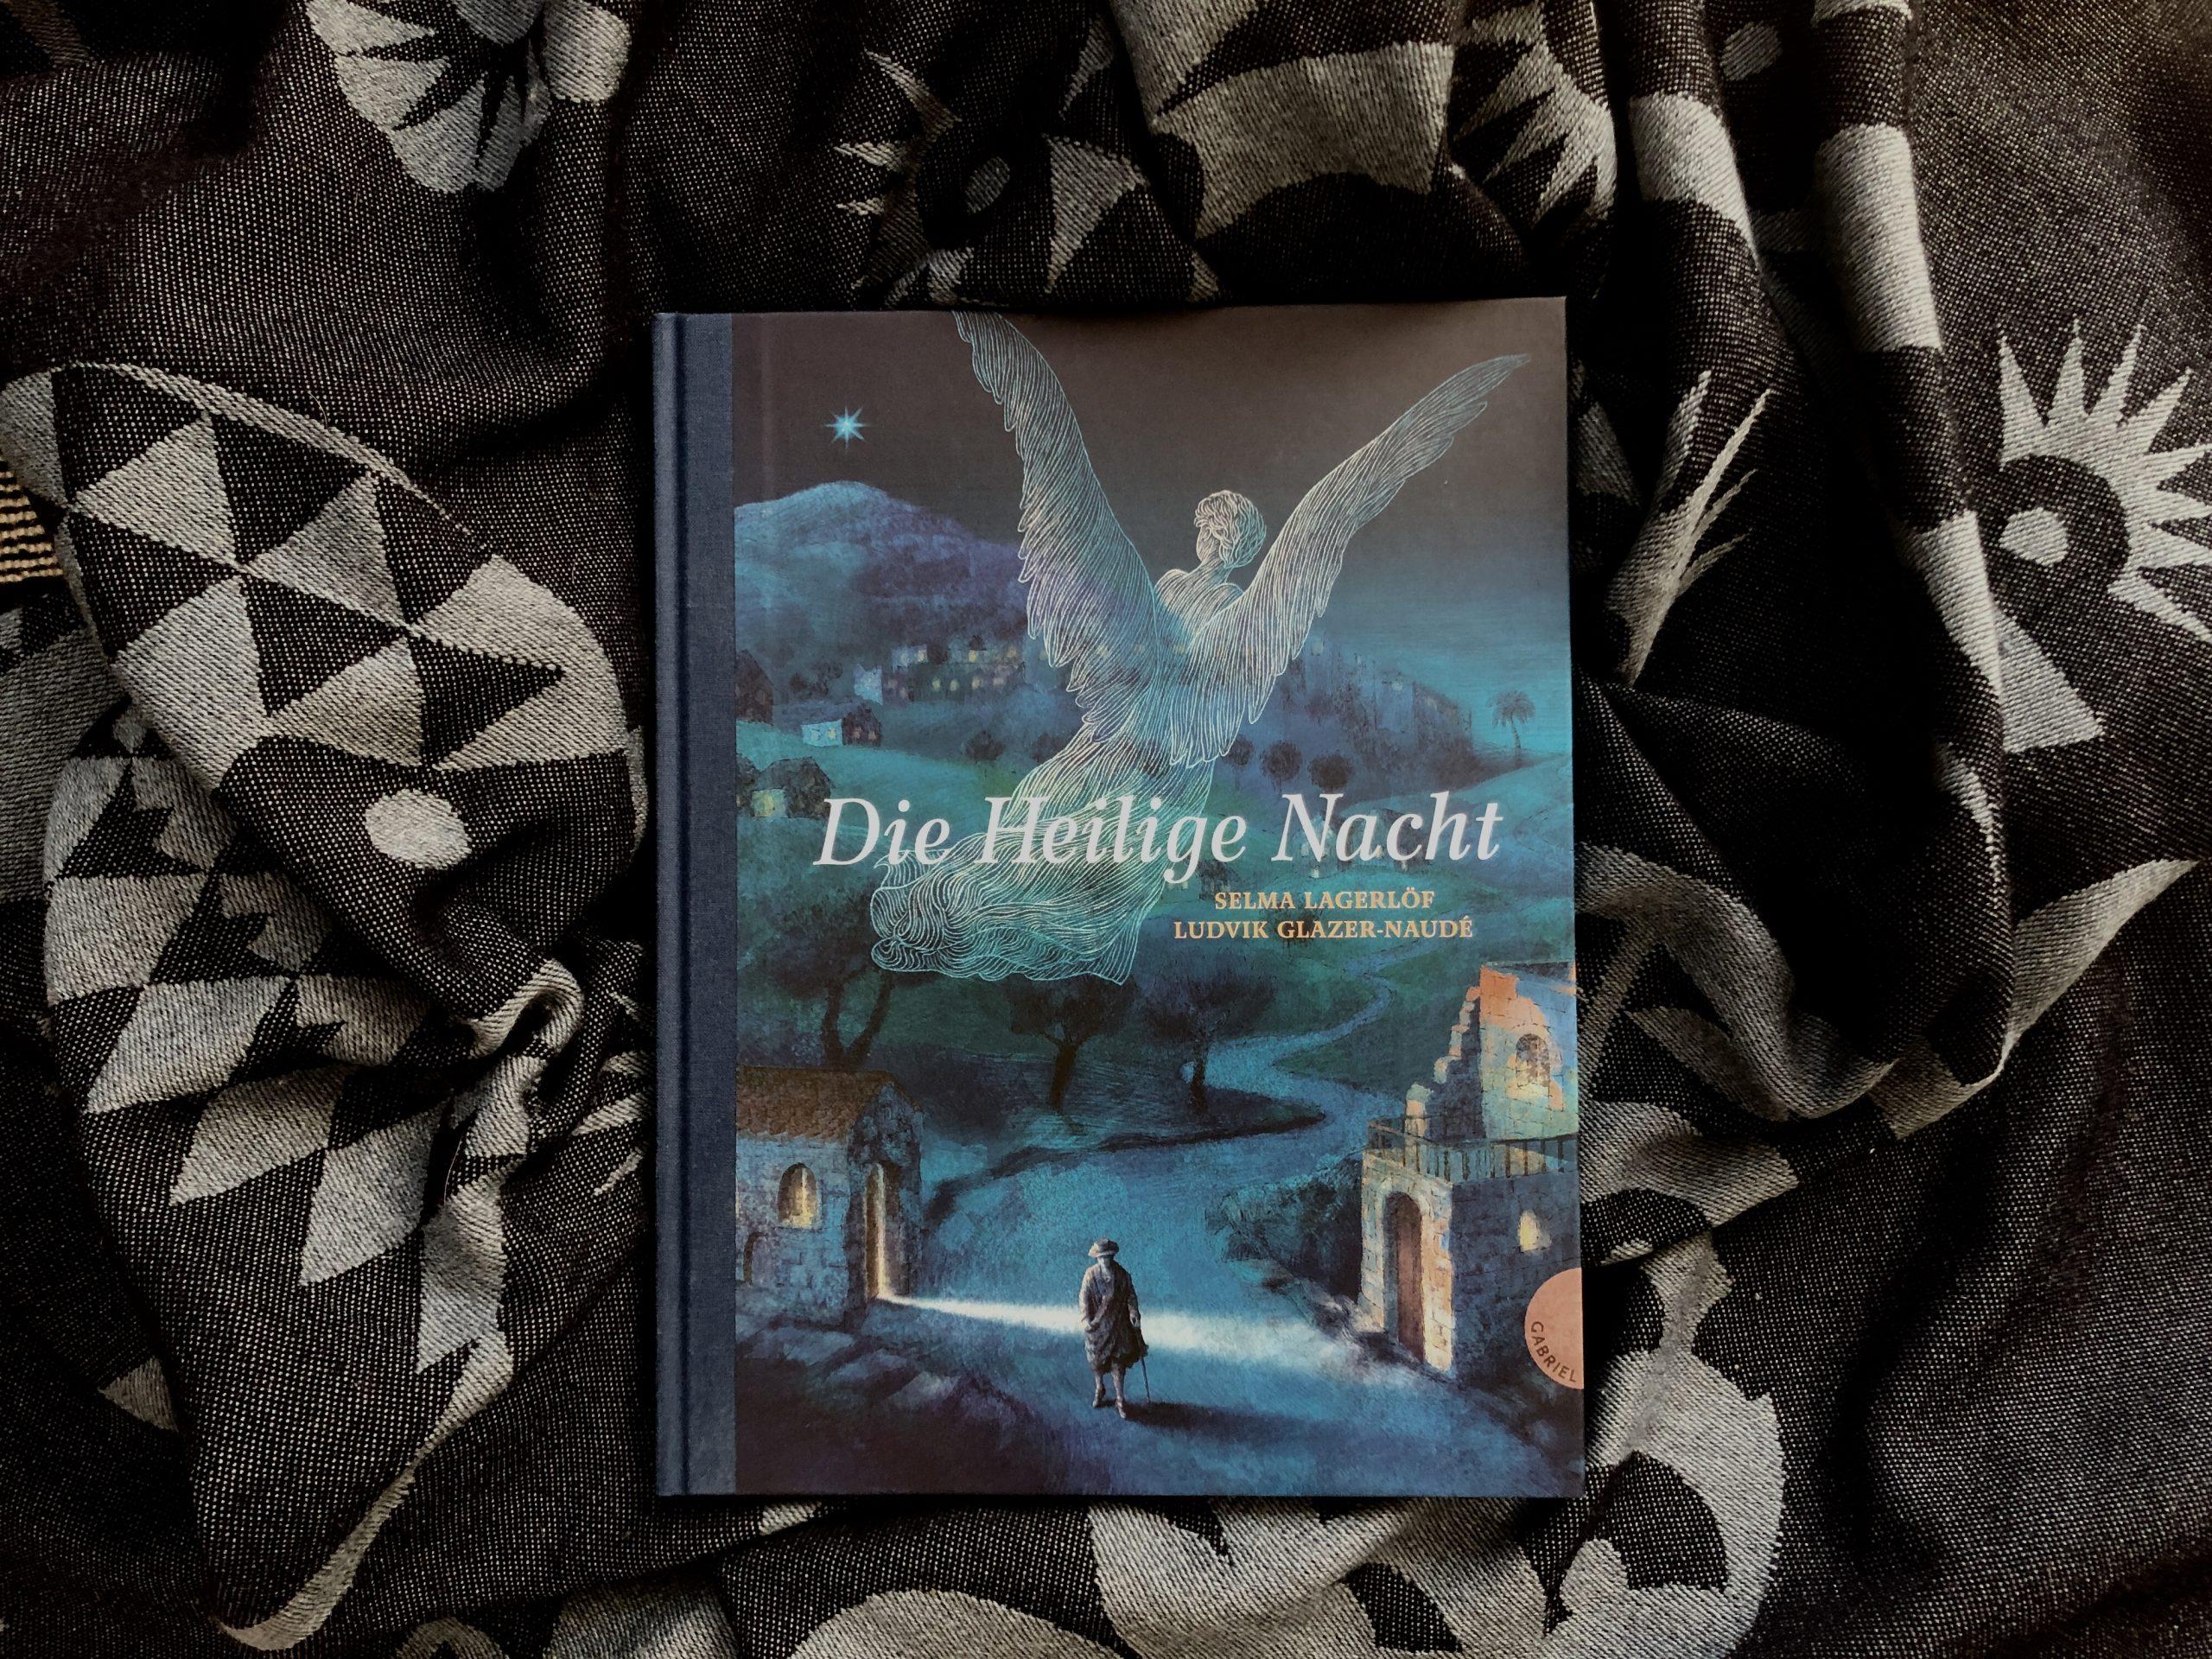 Selma Lagerlöf: Die Heilige Nacht